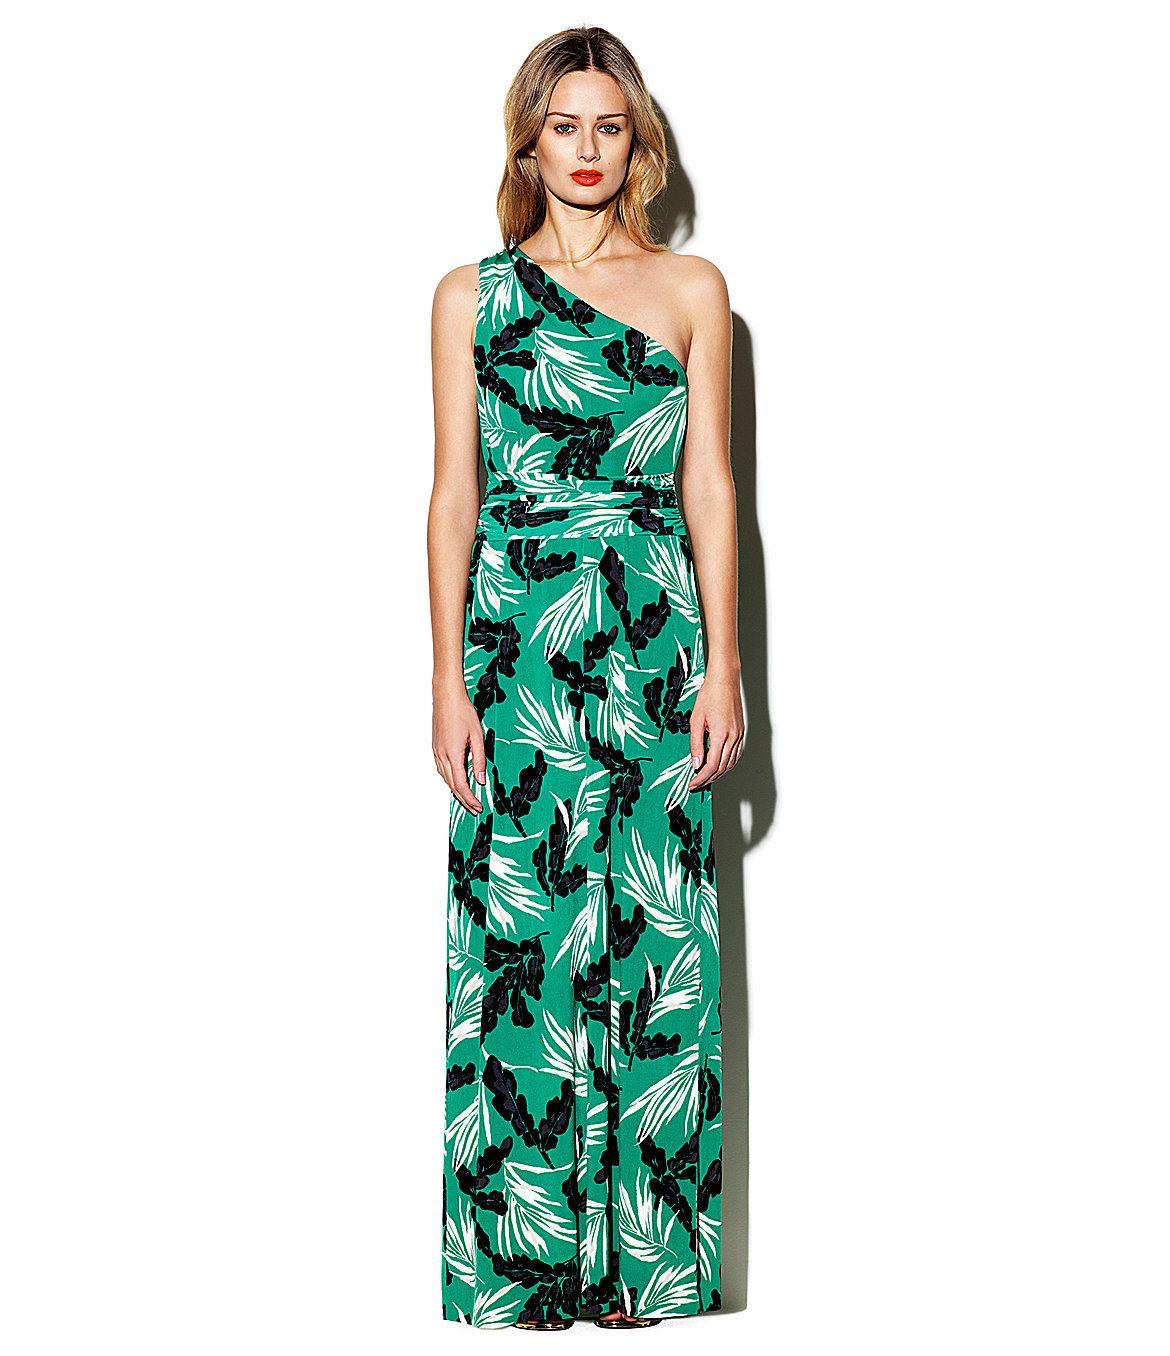 Vince camuto one shoulder maxi dress dillards dont forget vince camuto one shoulder maxi dress dillards ombrellifo Gallery